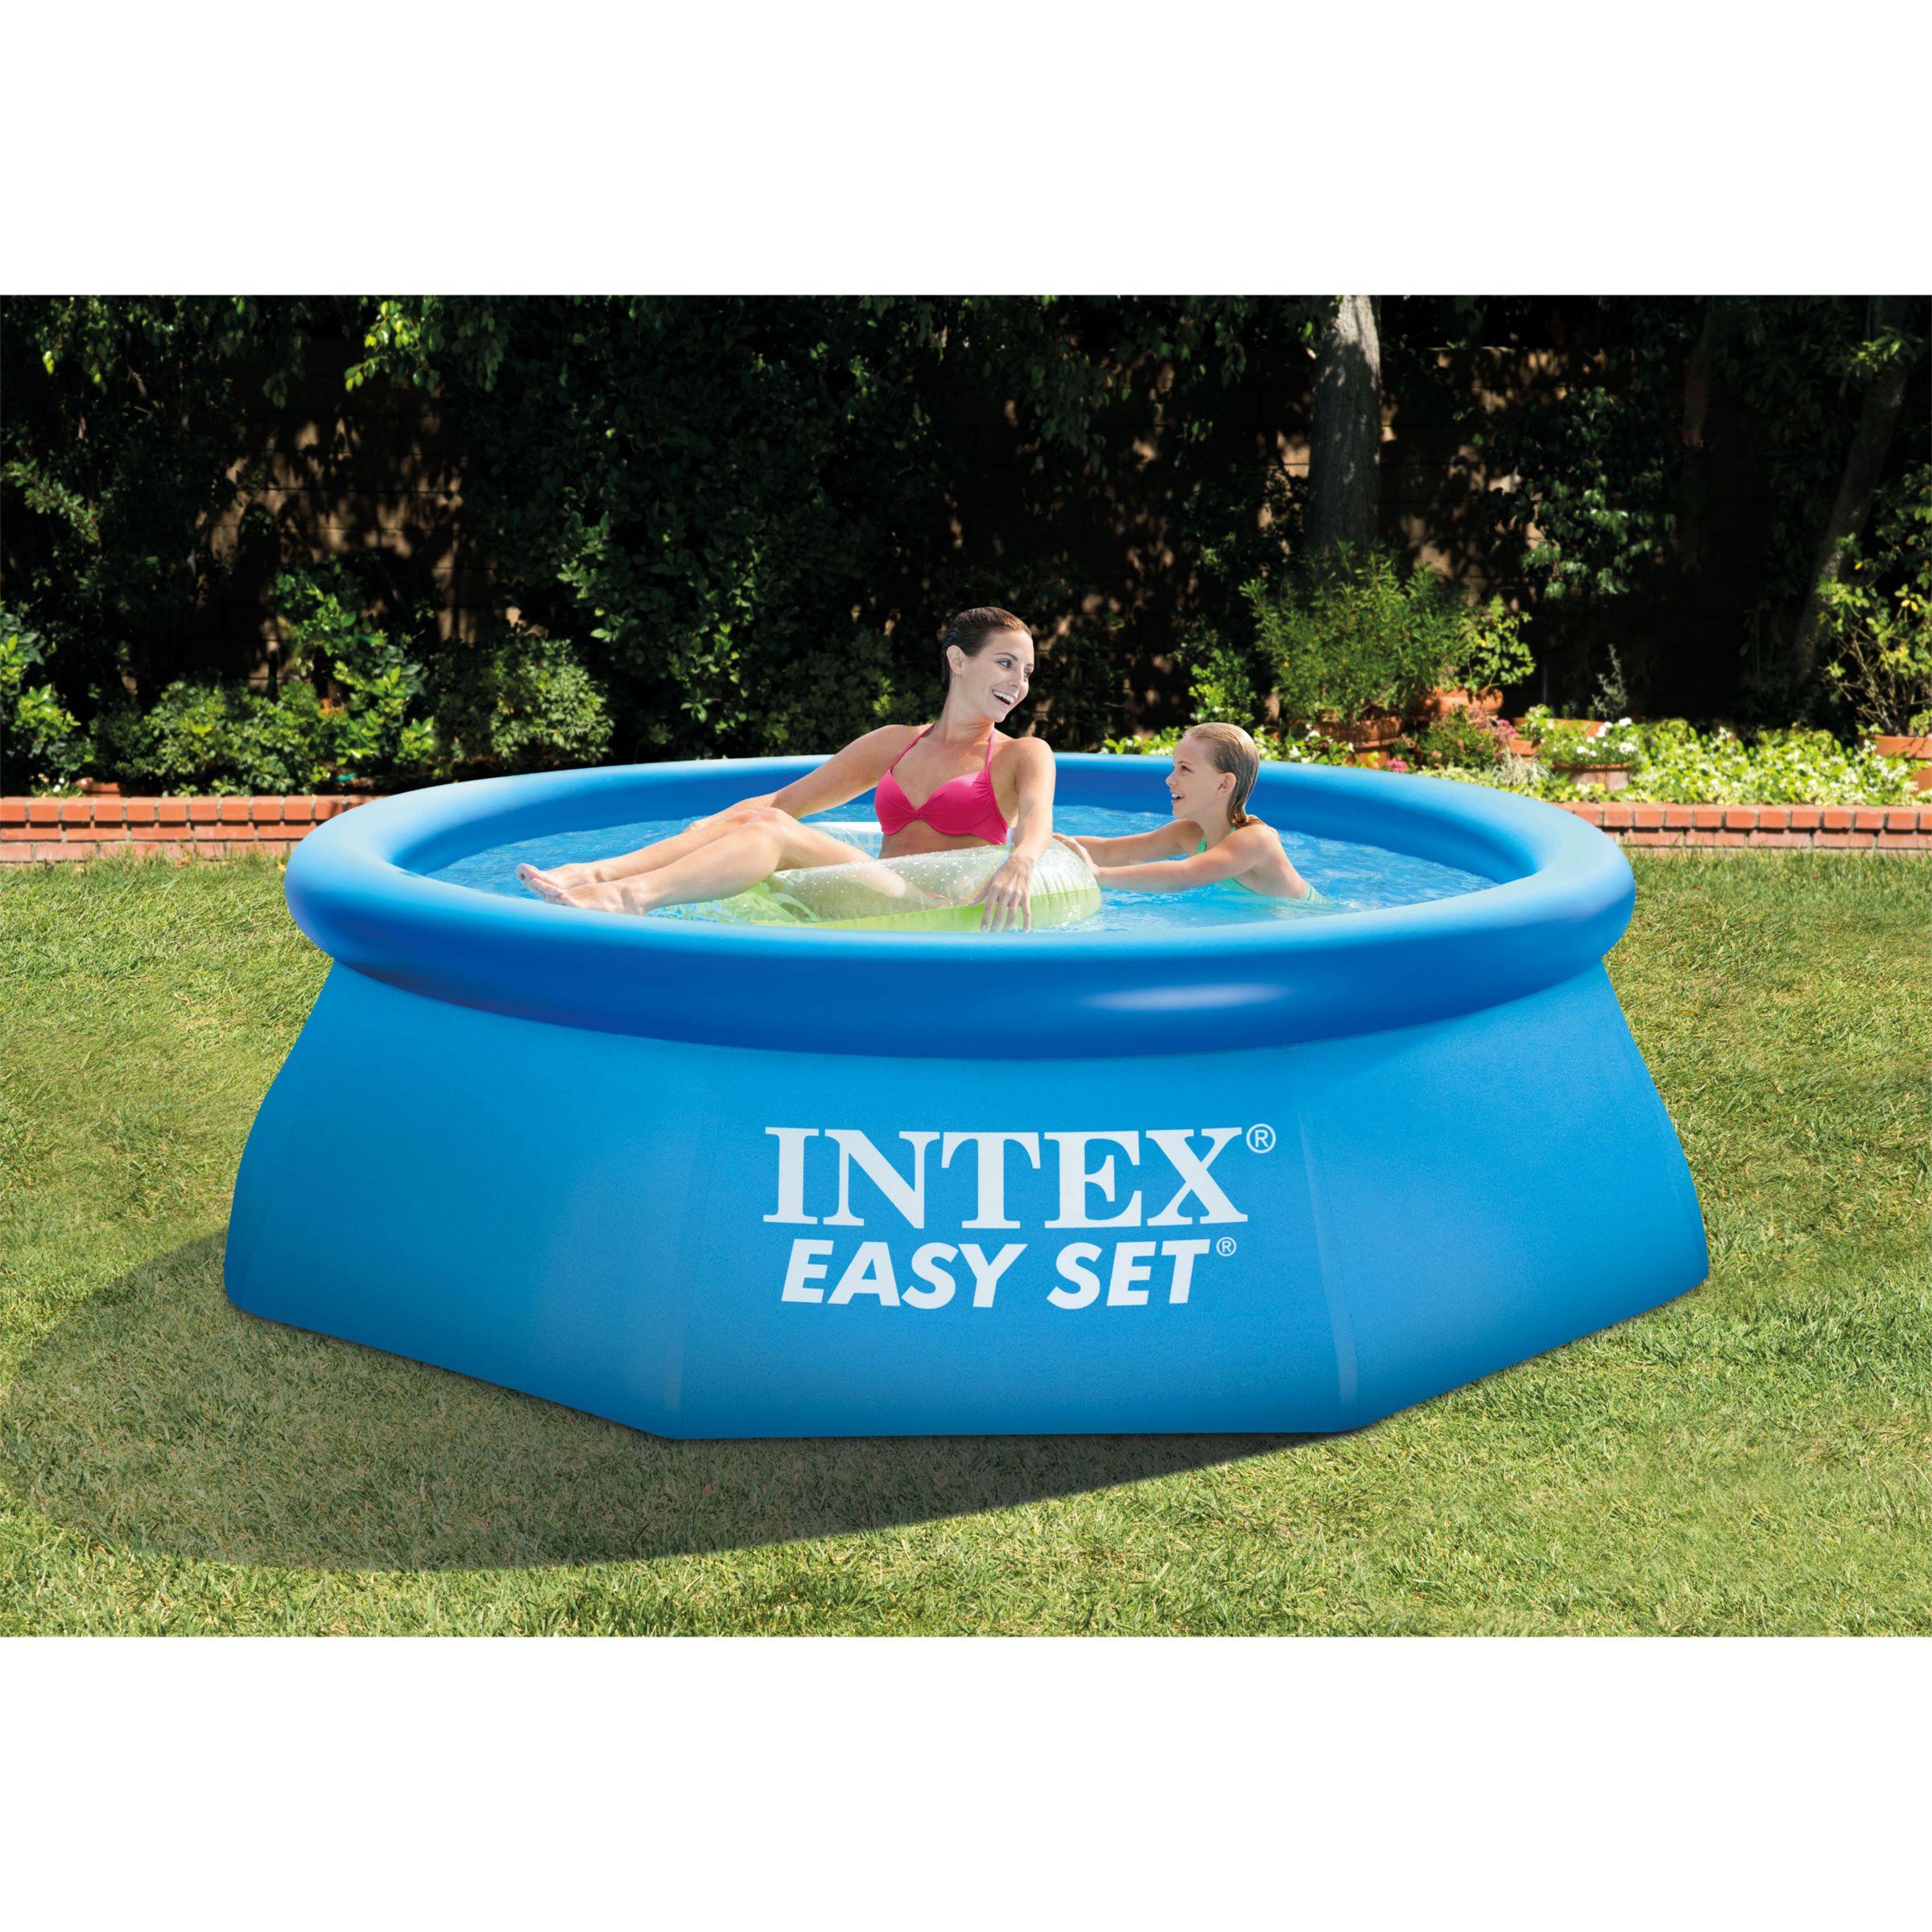 Intex Easy Set Pool, 8ft